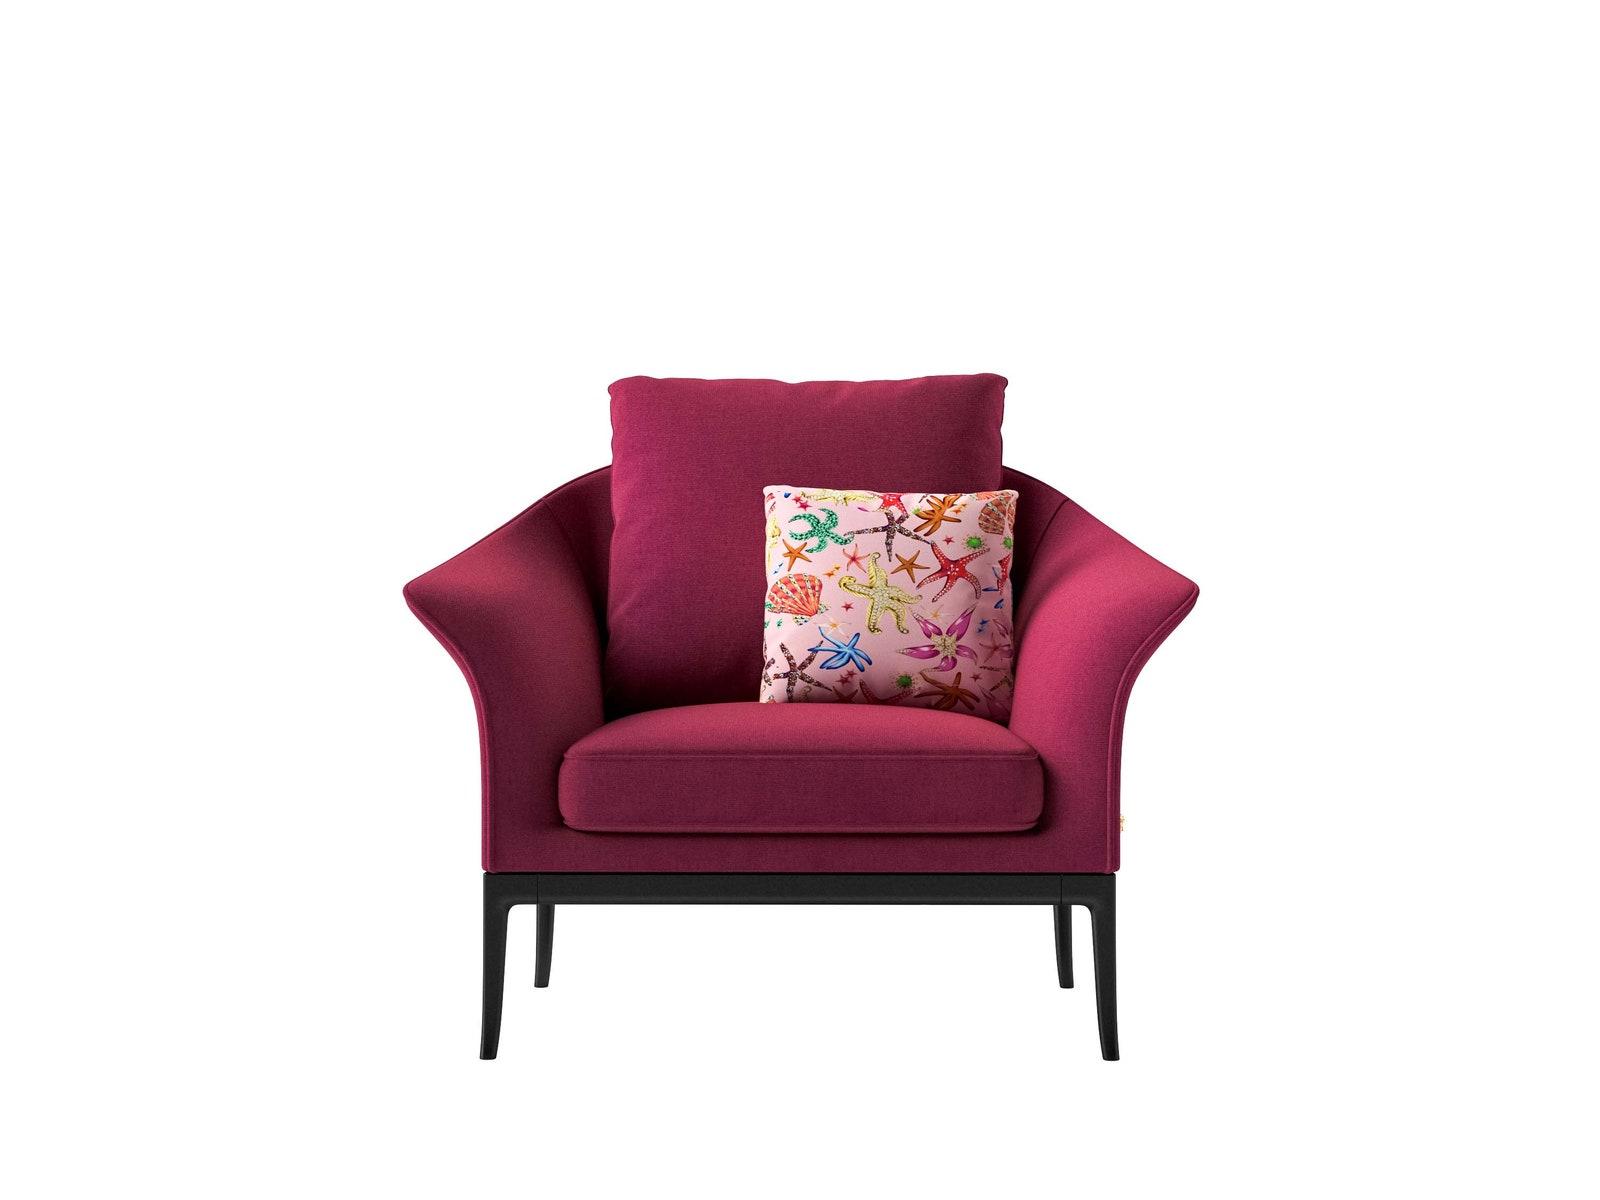 Versace. Stiletto Armchair.